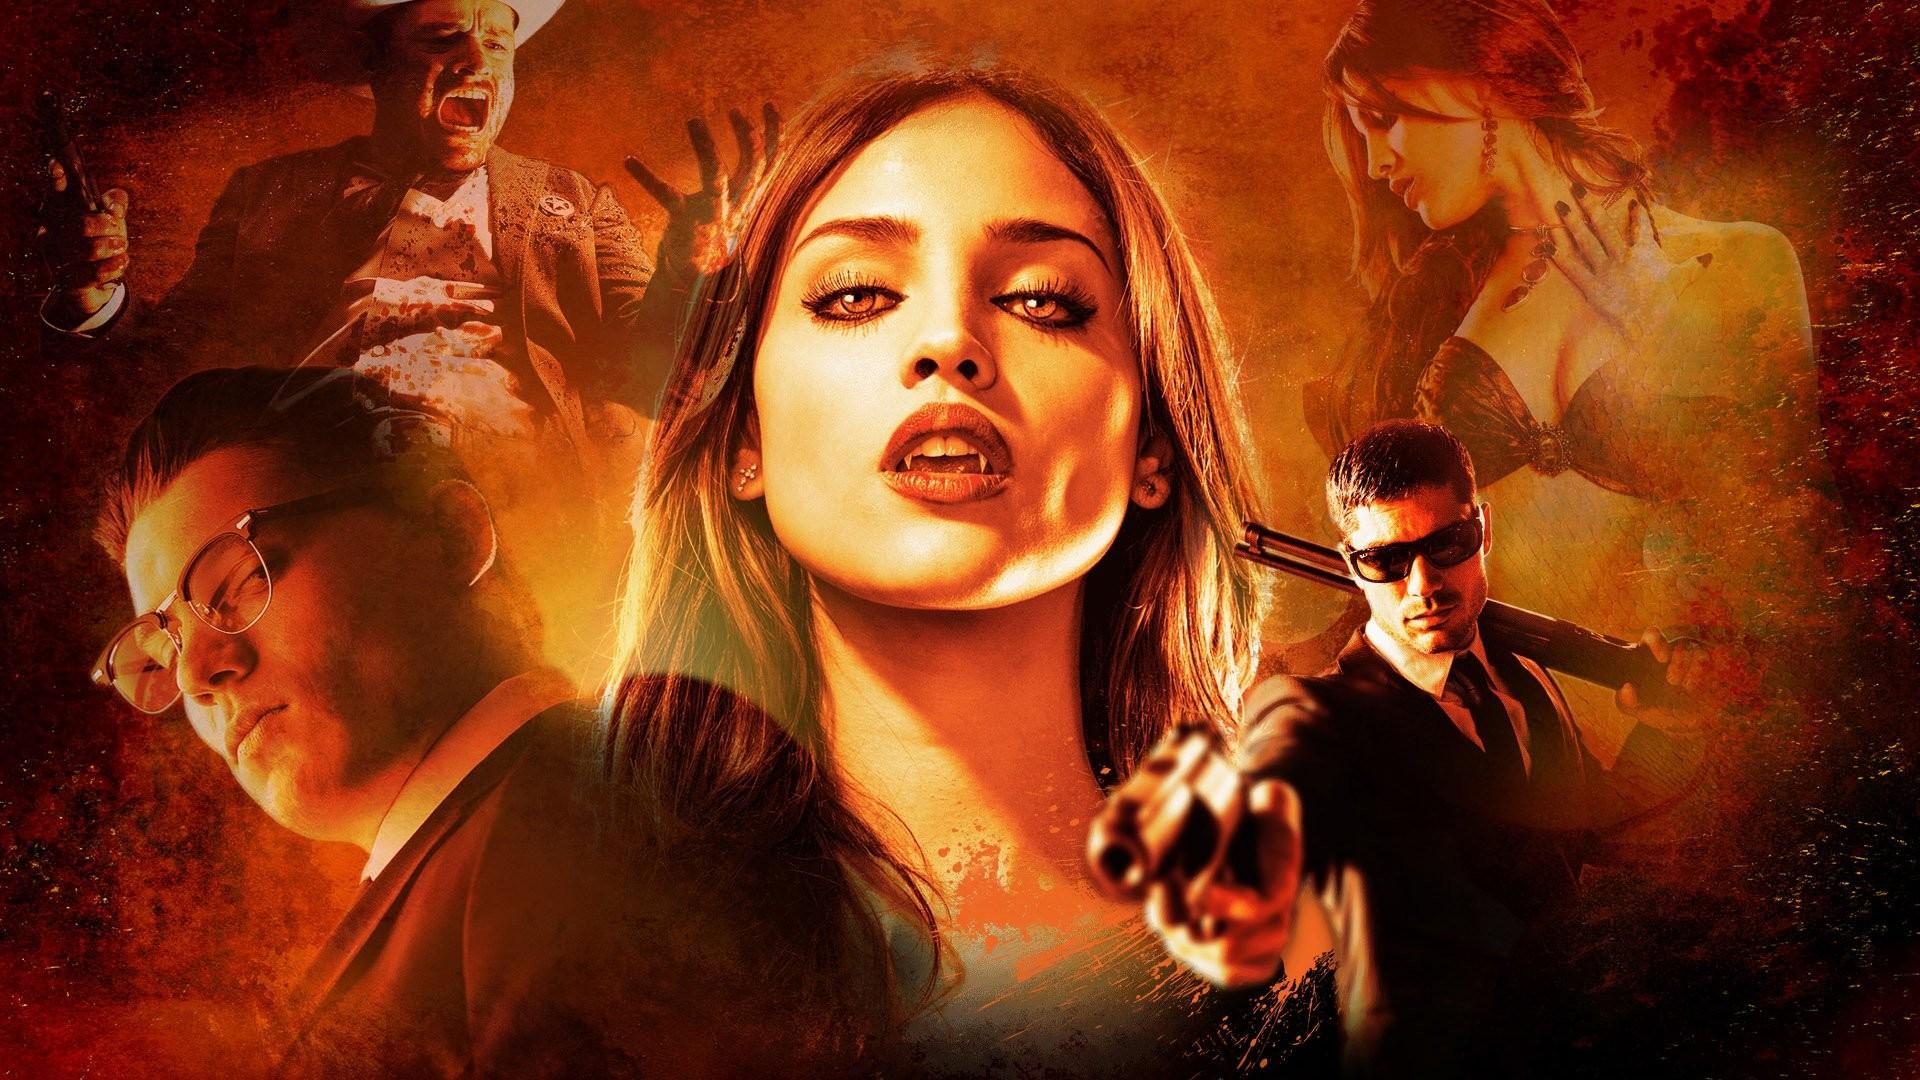 FROM DUSK TILL DAWN action crime horror series vampire wallpaper |  | 405204 | WallpaperUP